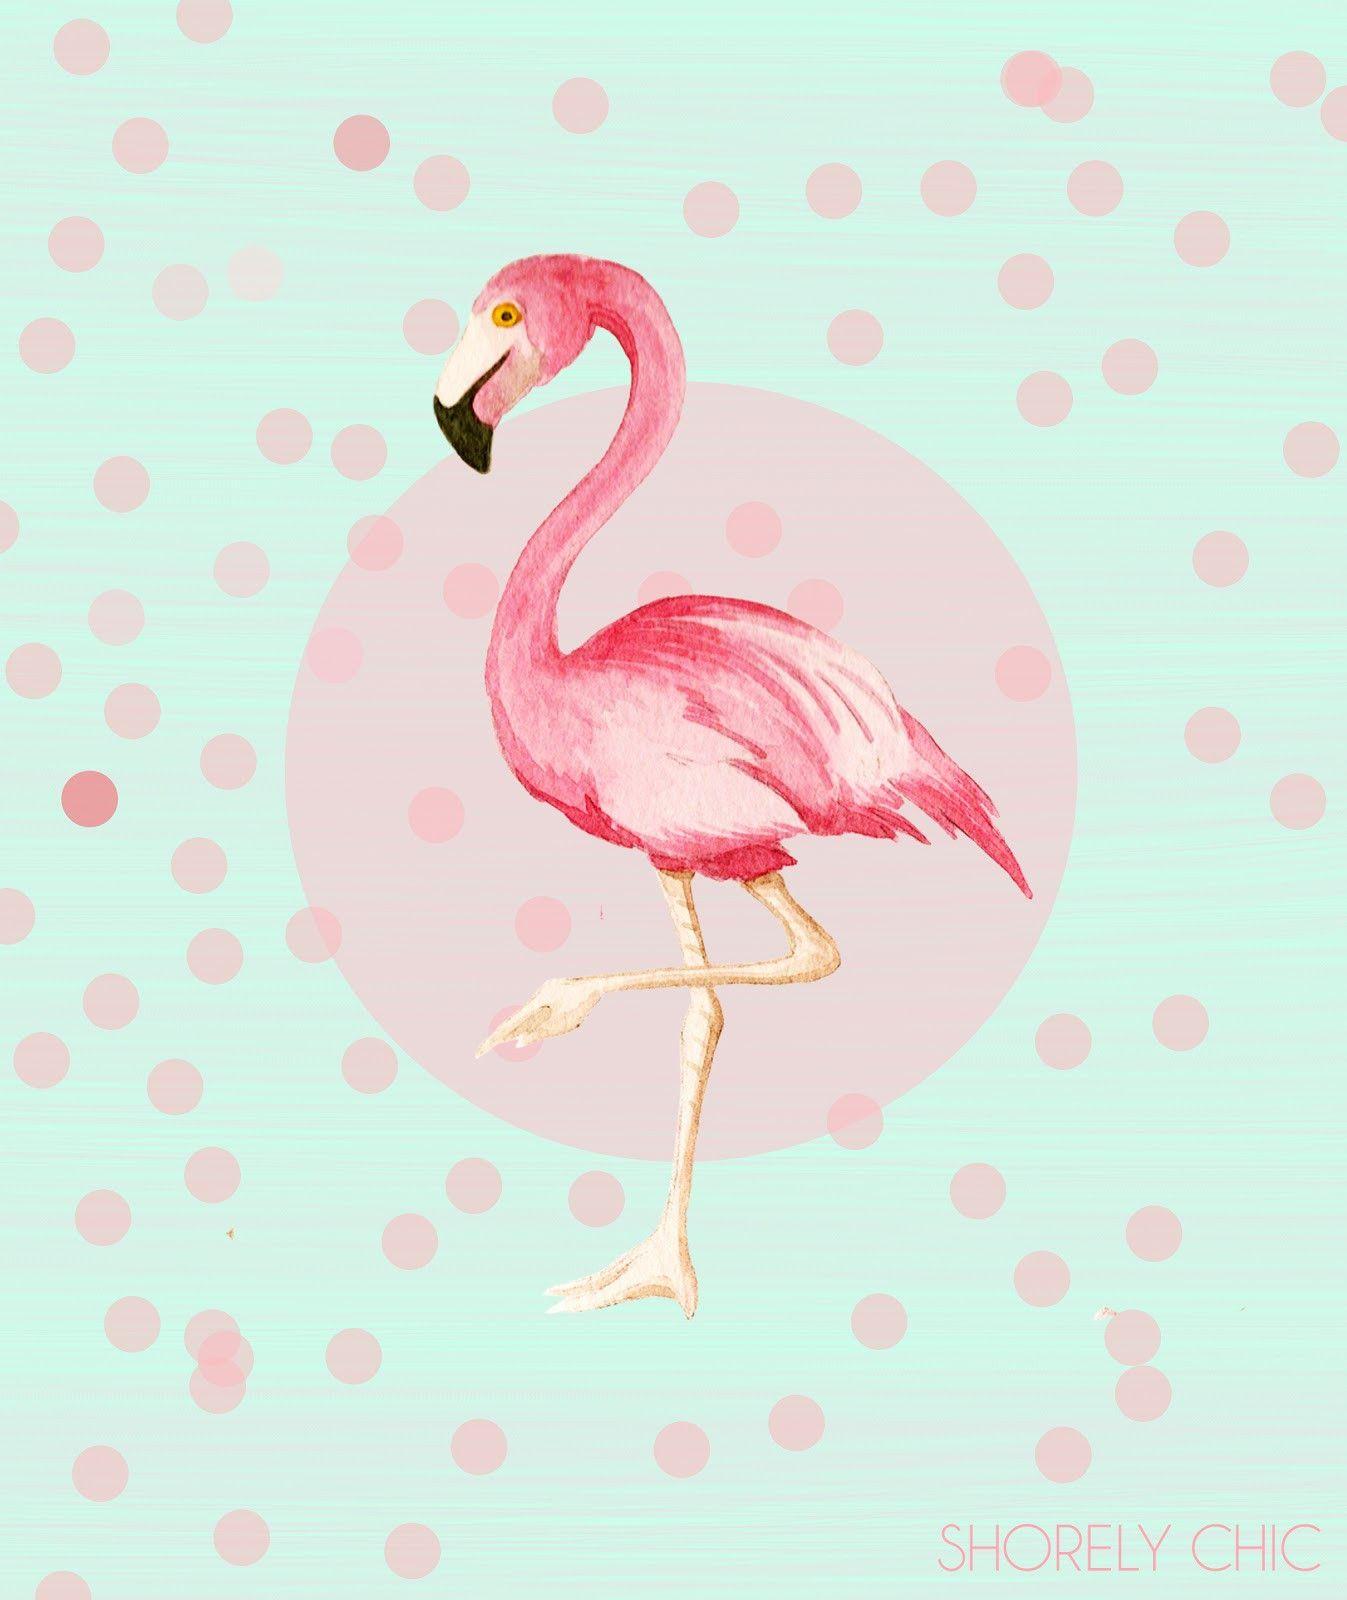 Home decor accessories heyla uk screen savers for Flamingo dekoration